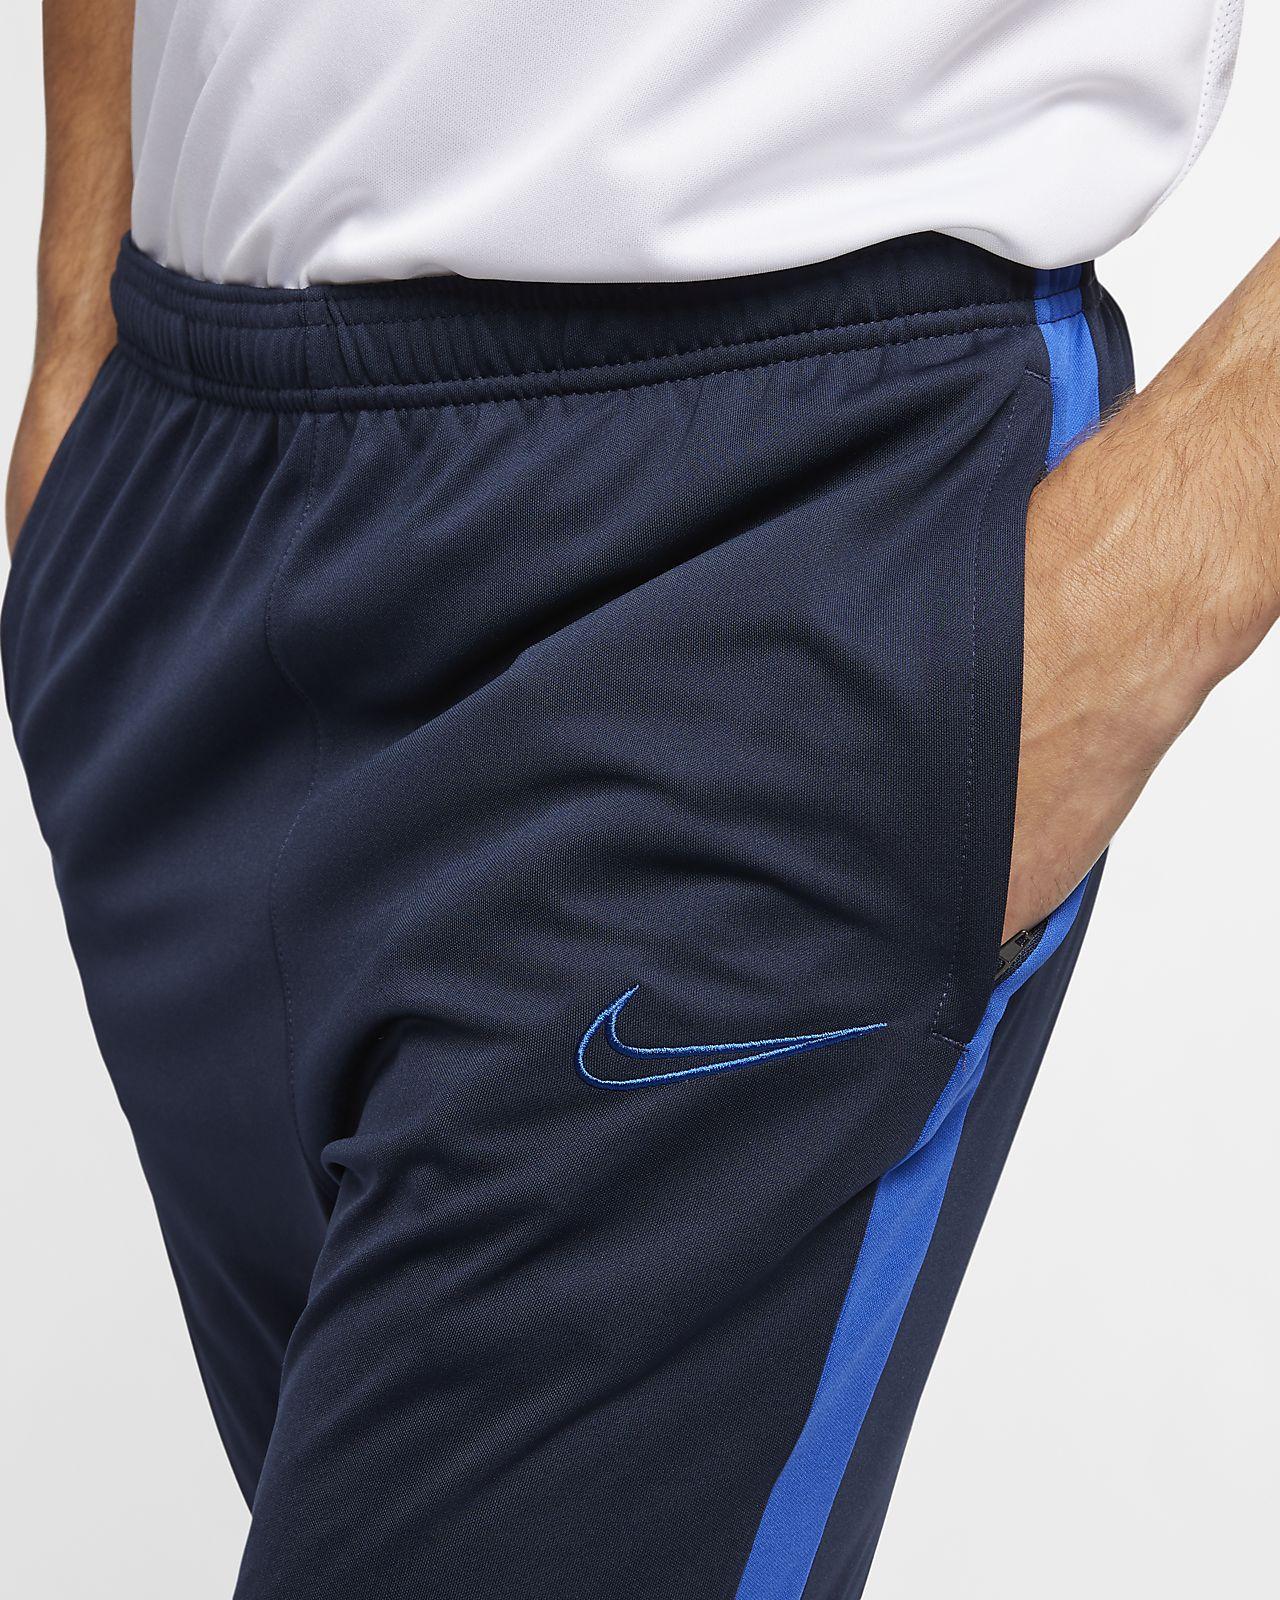 6bd6abb38935d Nike Dri-FIT Academy Men s Football Pants. Nike.com GB